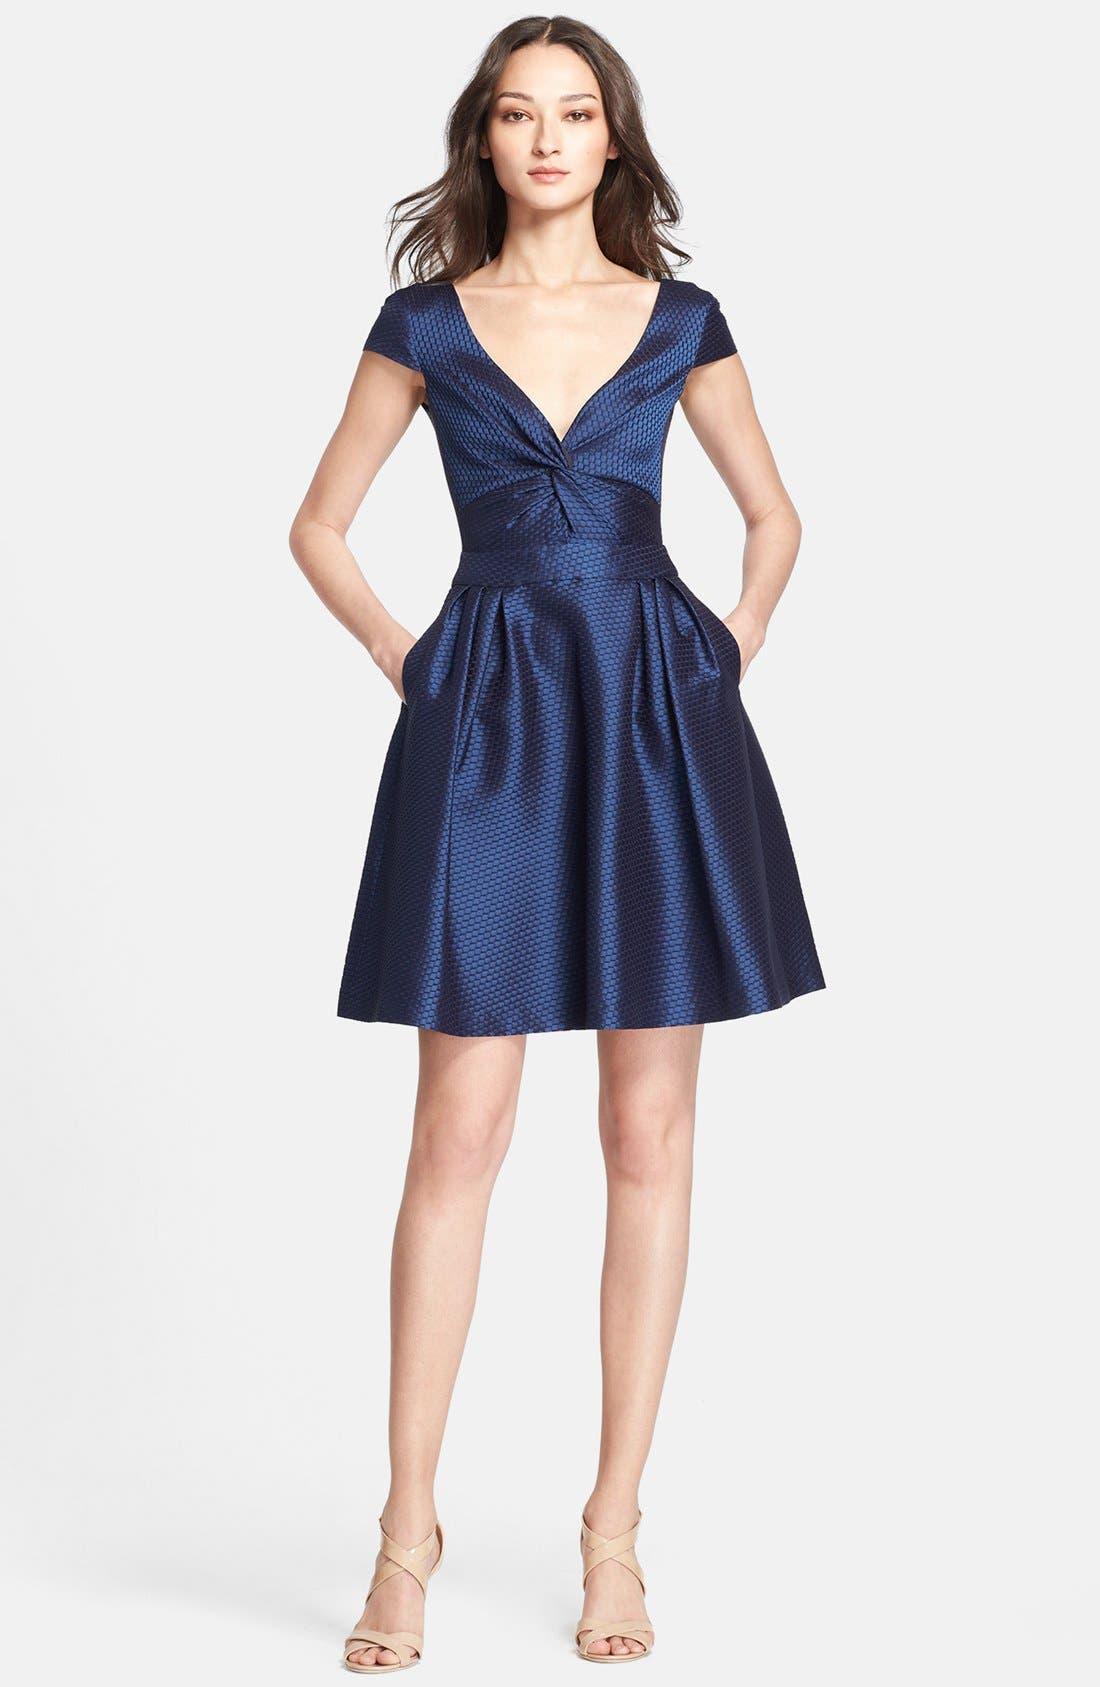 Main Image - Armani Collezioni Honeycomb Weave Full Skirt Dress